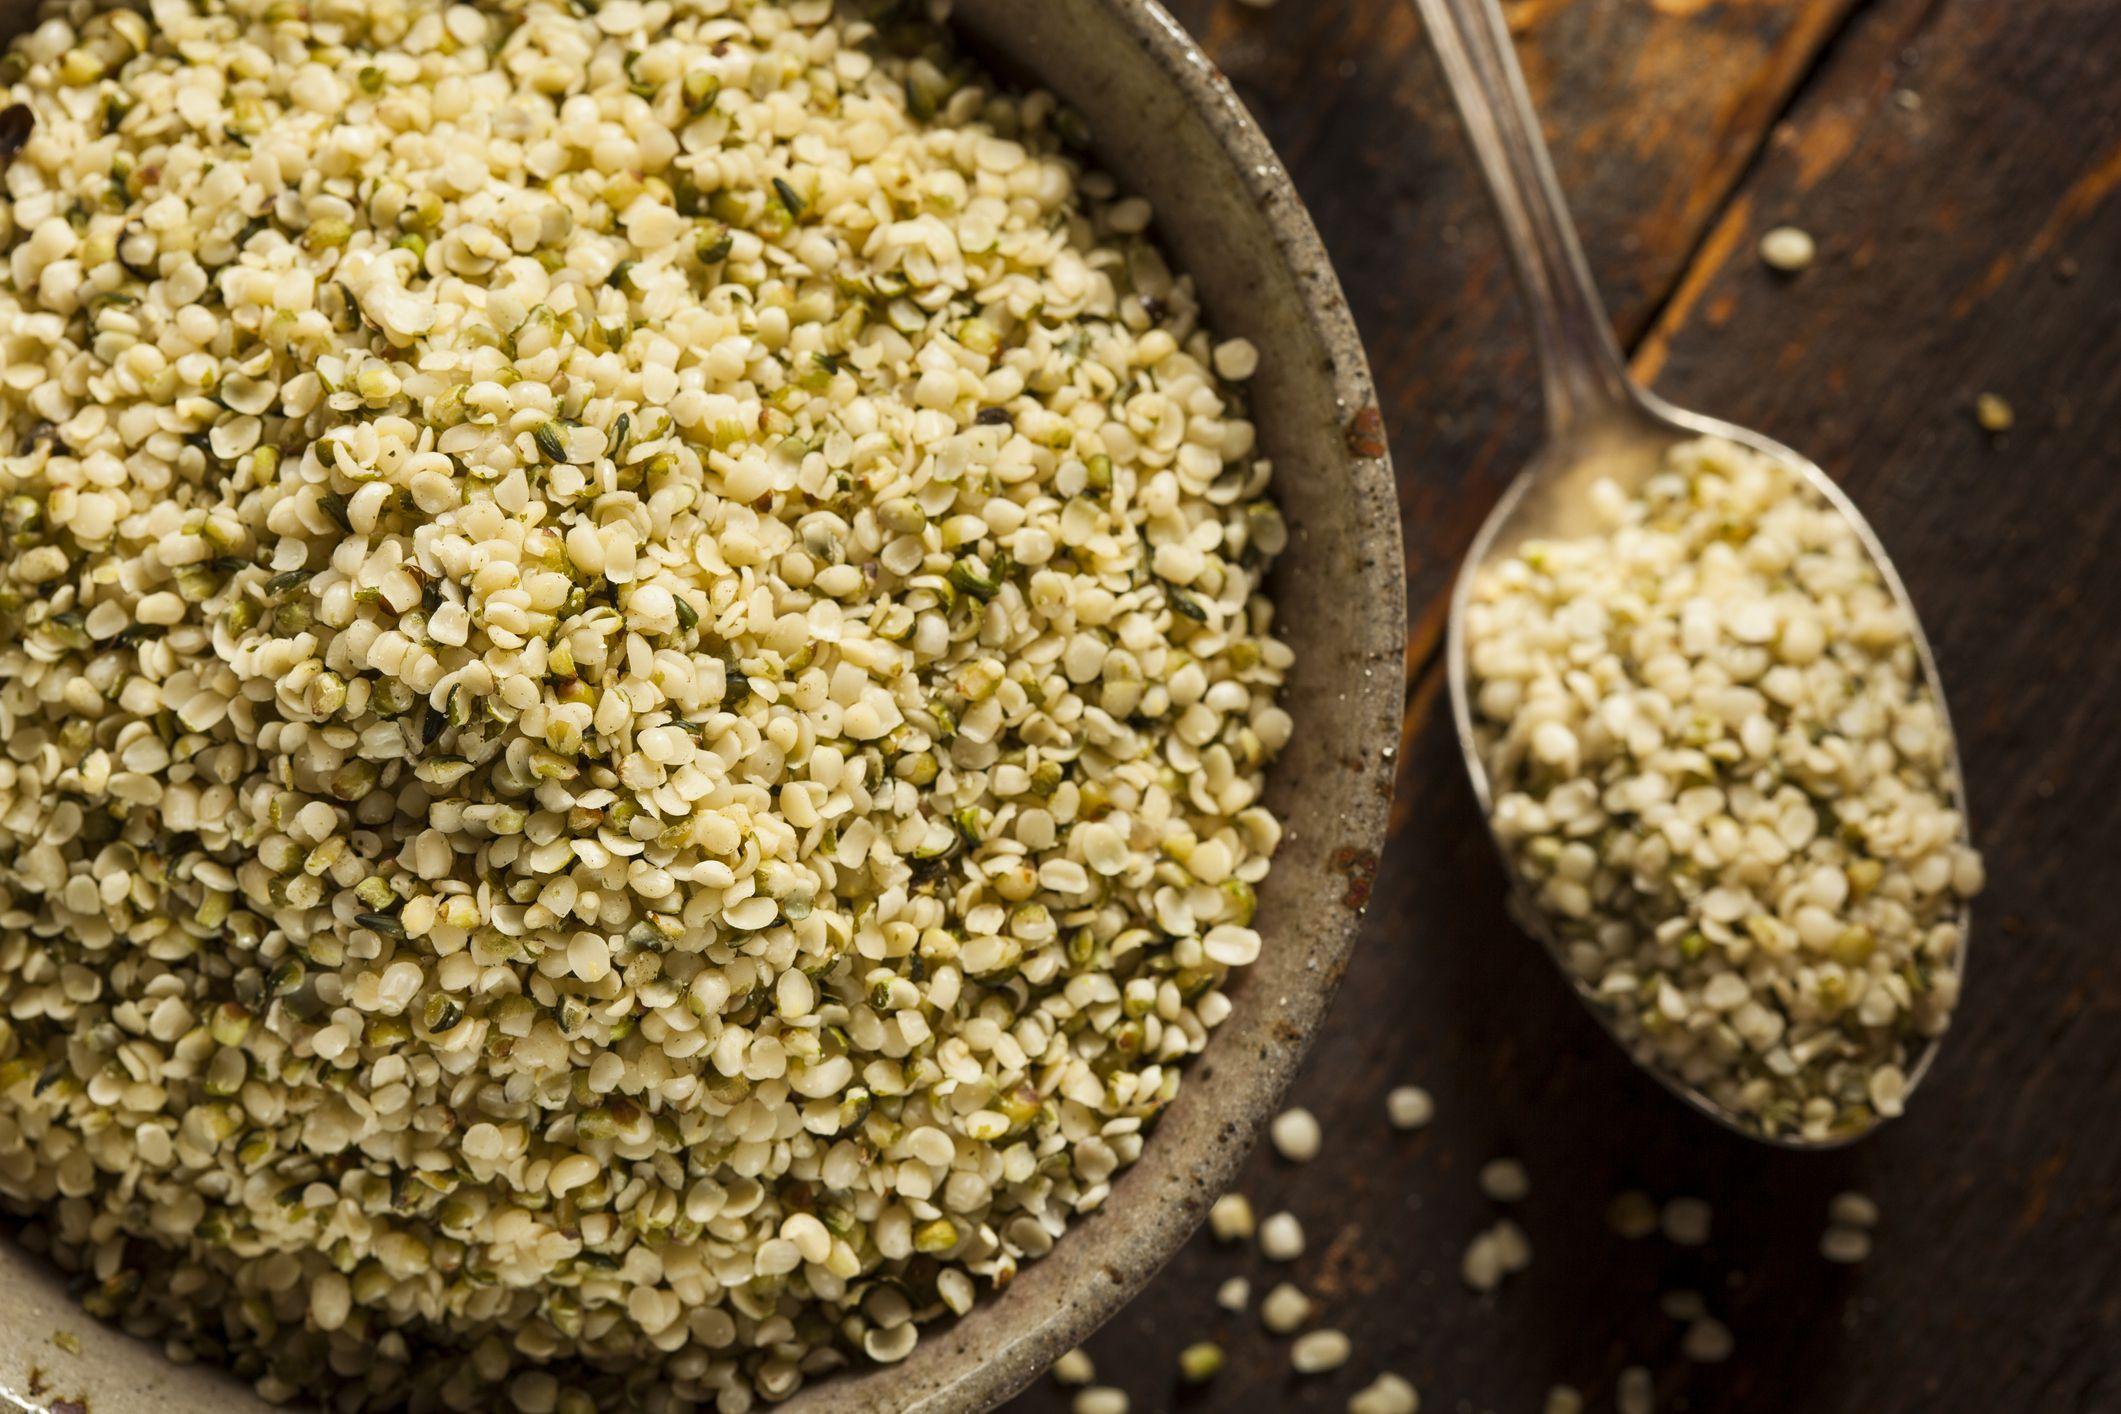 Uses And Health Benefits Of Eating Hemp Seeds